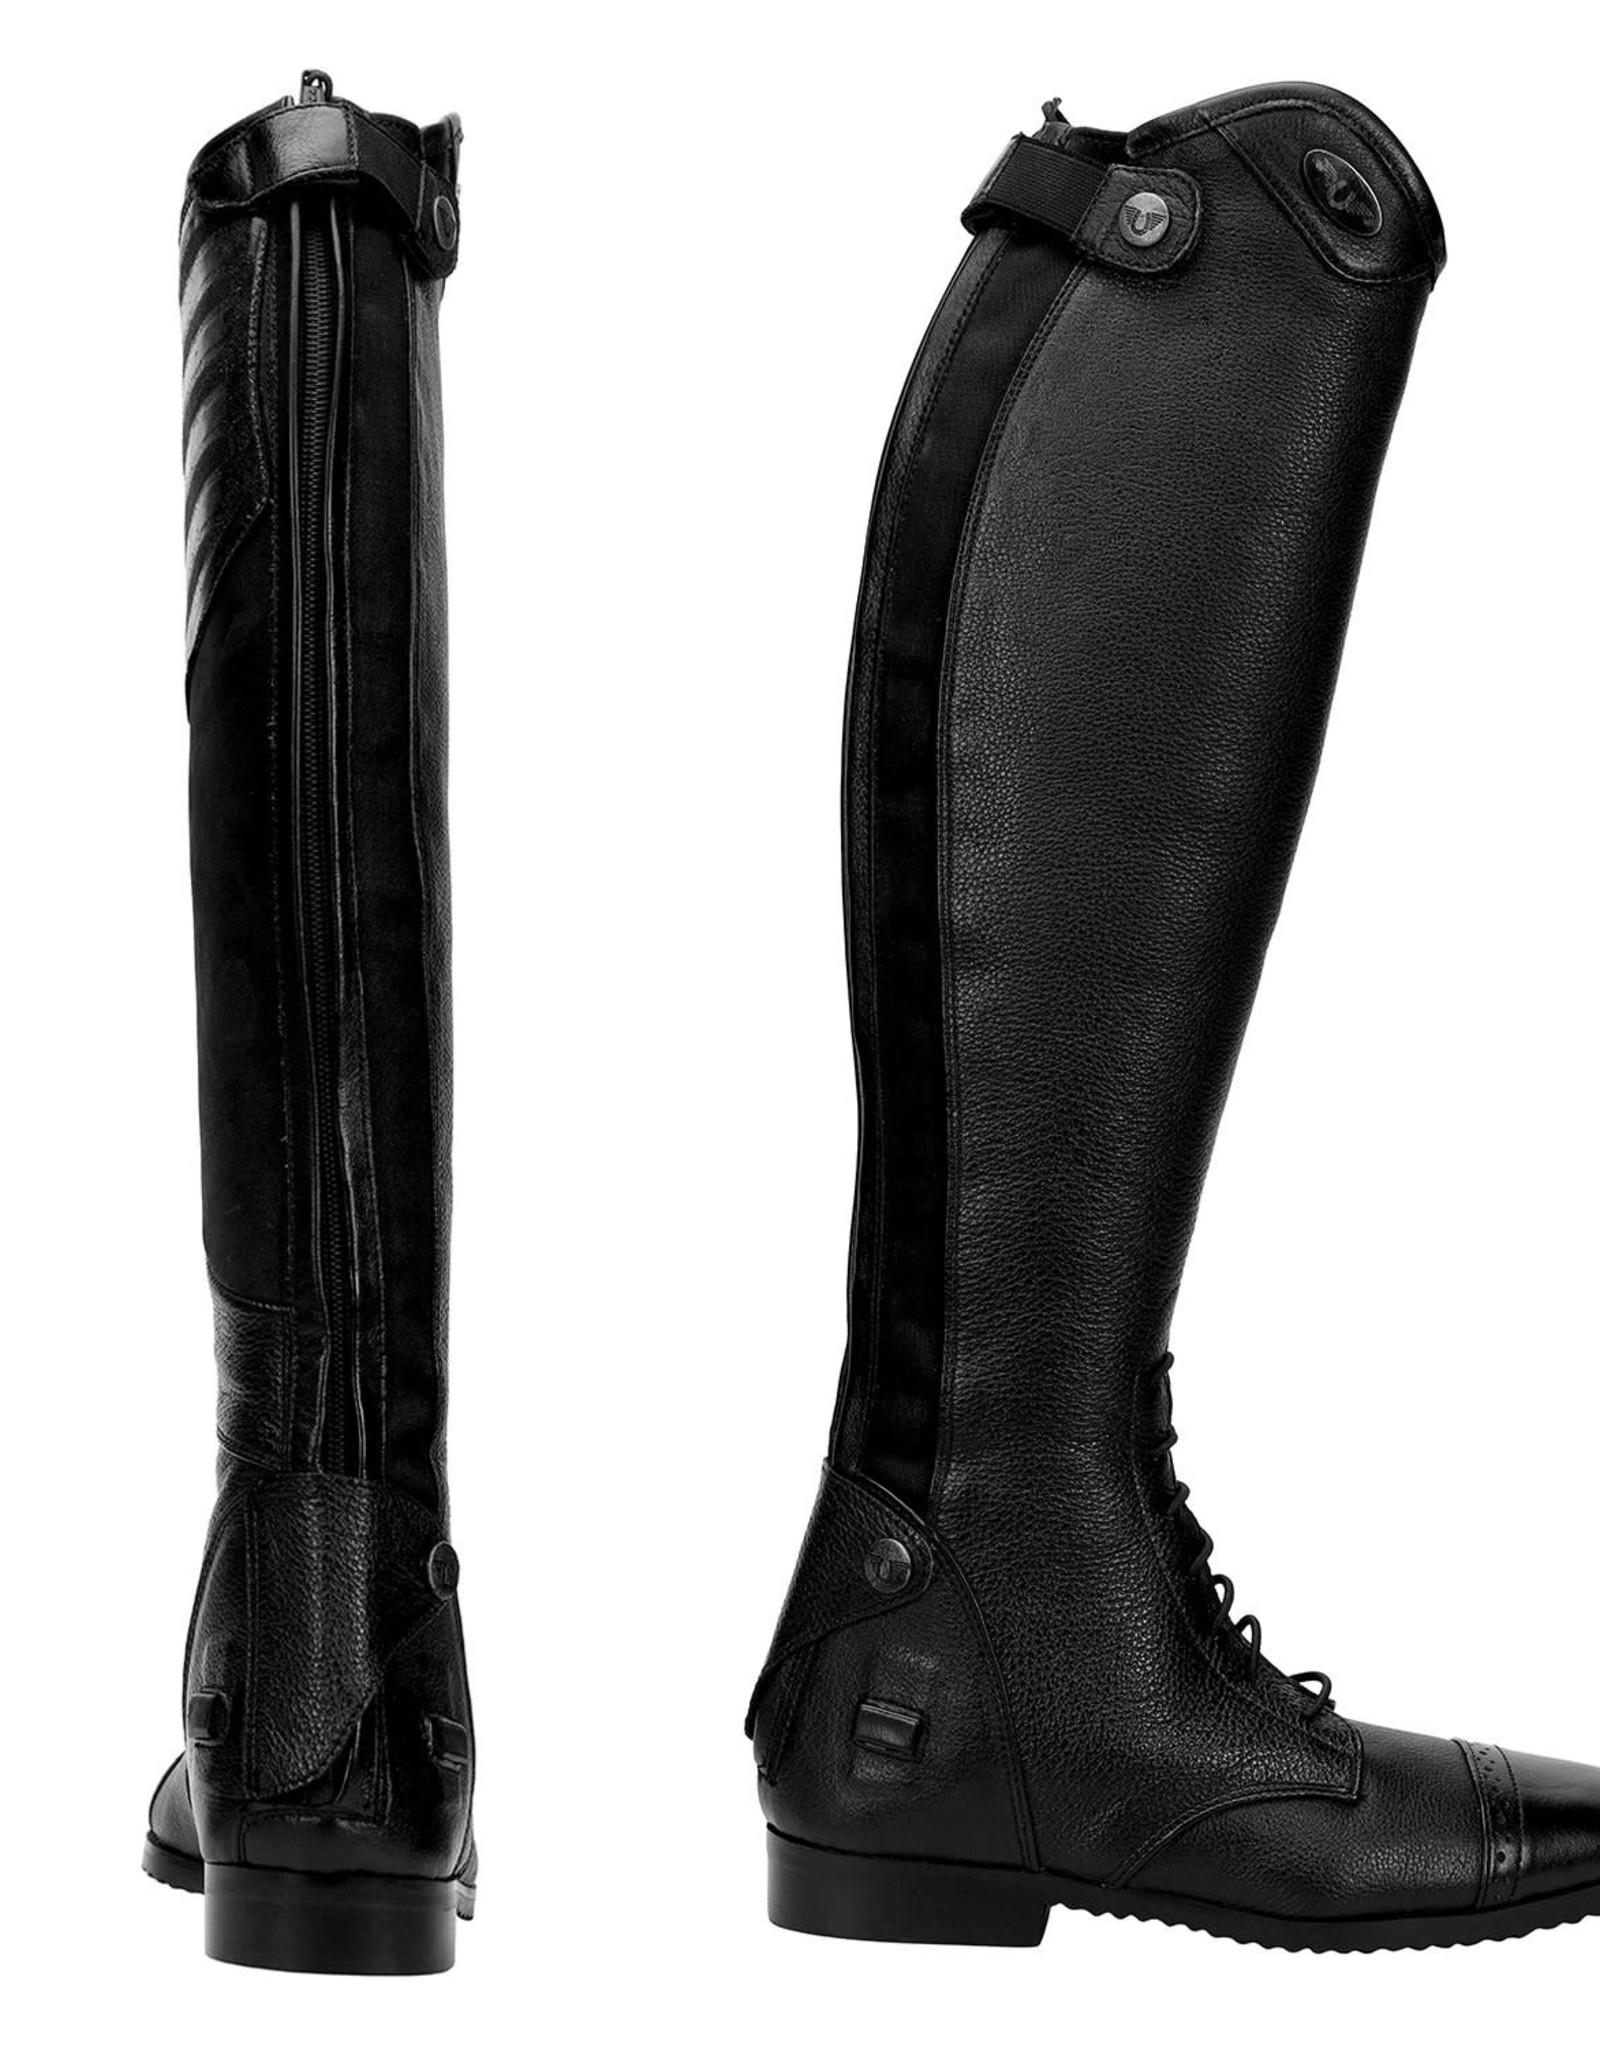 Tuff Rider Regal Supreme Field Boots